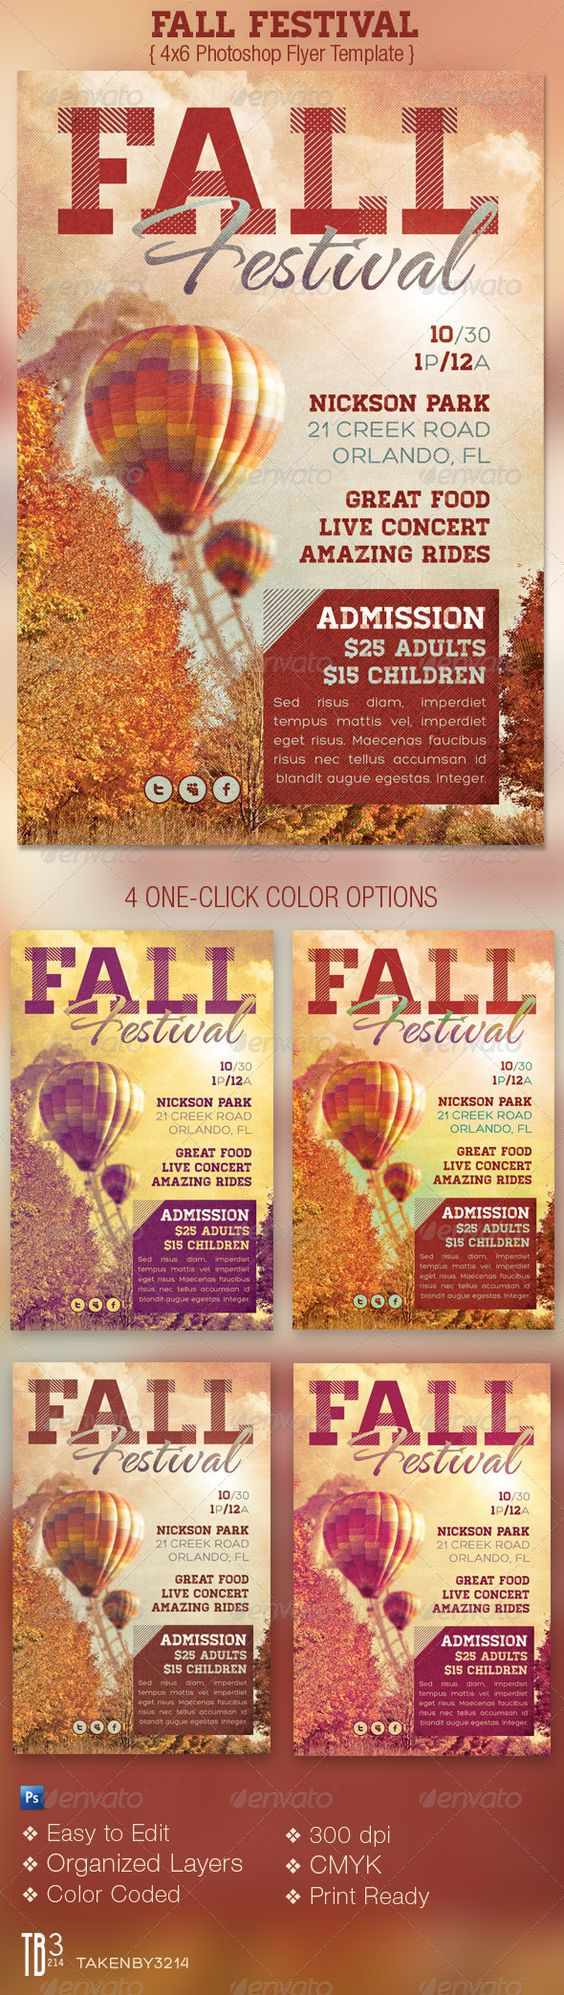 Fall Festival Event Flyer Template   Event Flyers, Fall Festivals ...